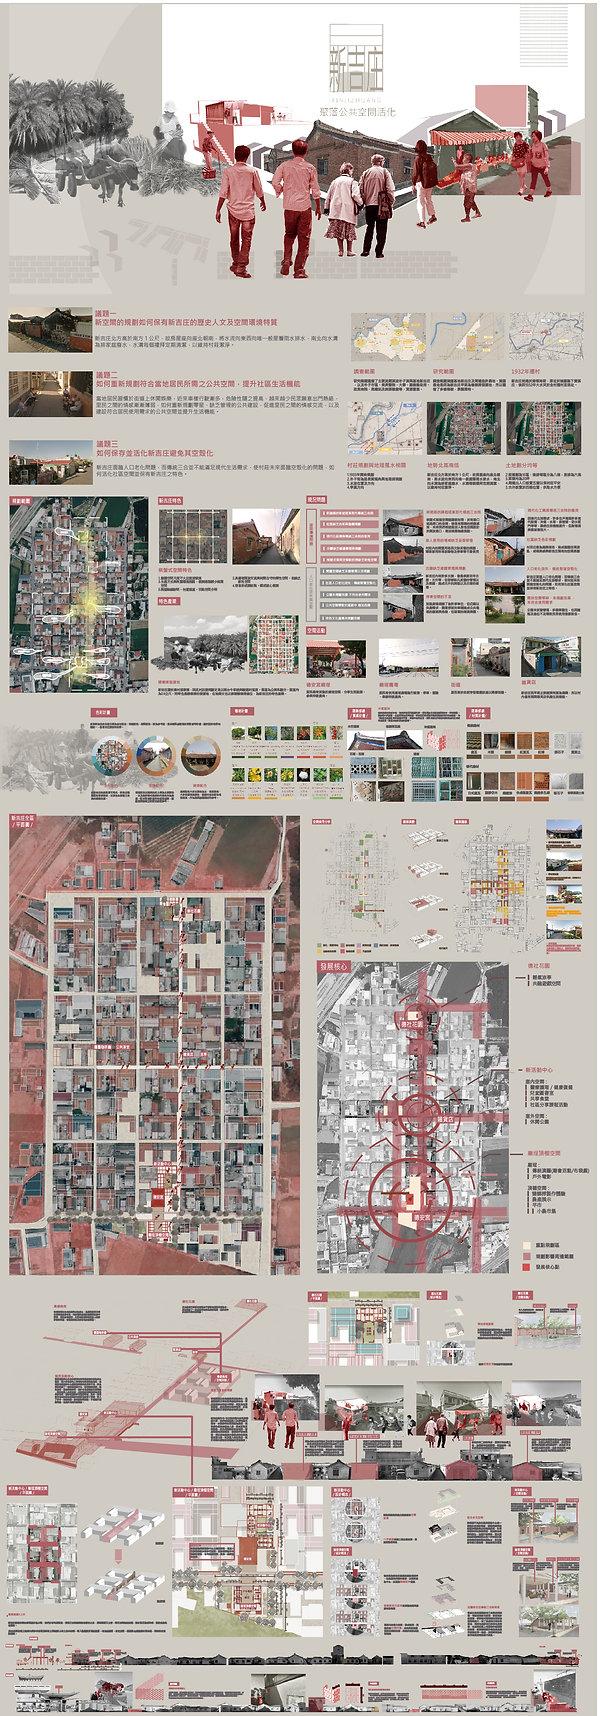 B02嘉義新吉庄聚落空間活化-大圖.jpg